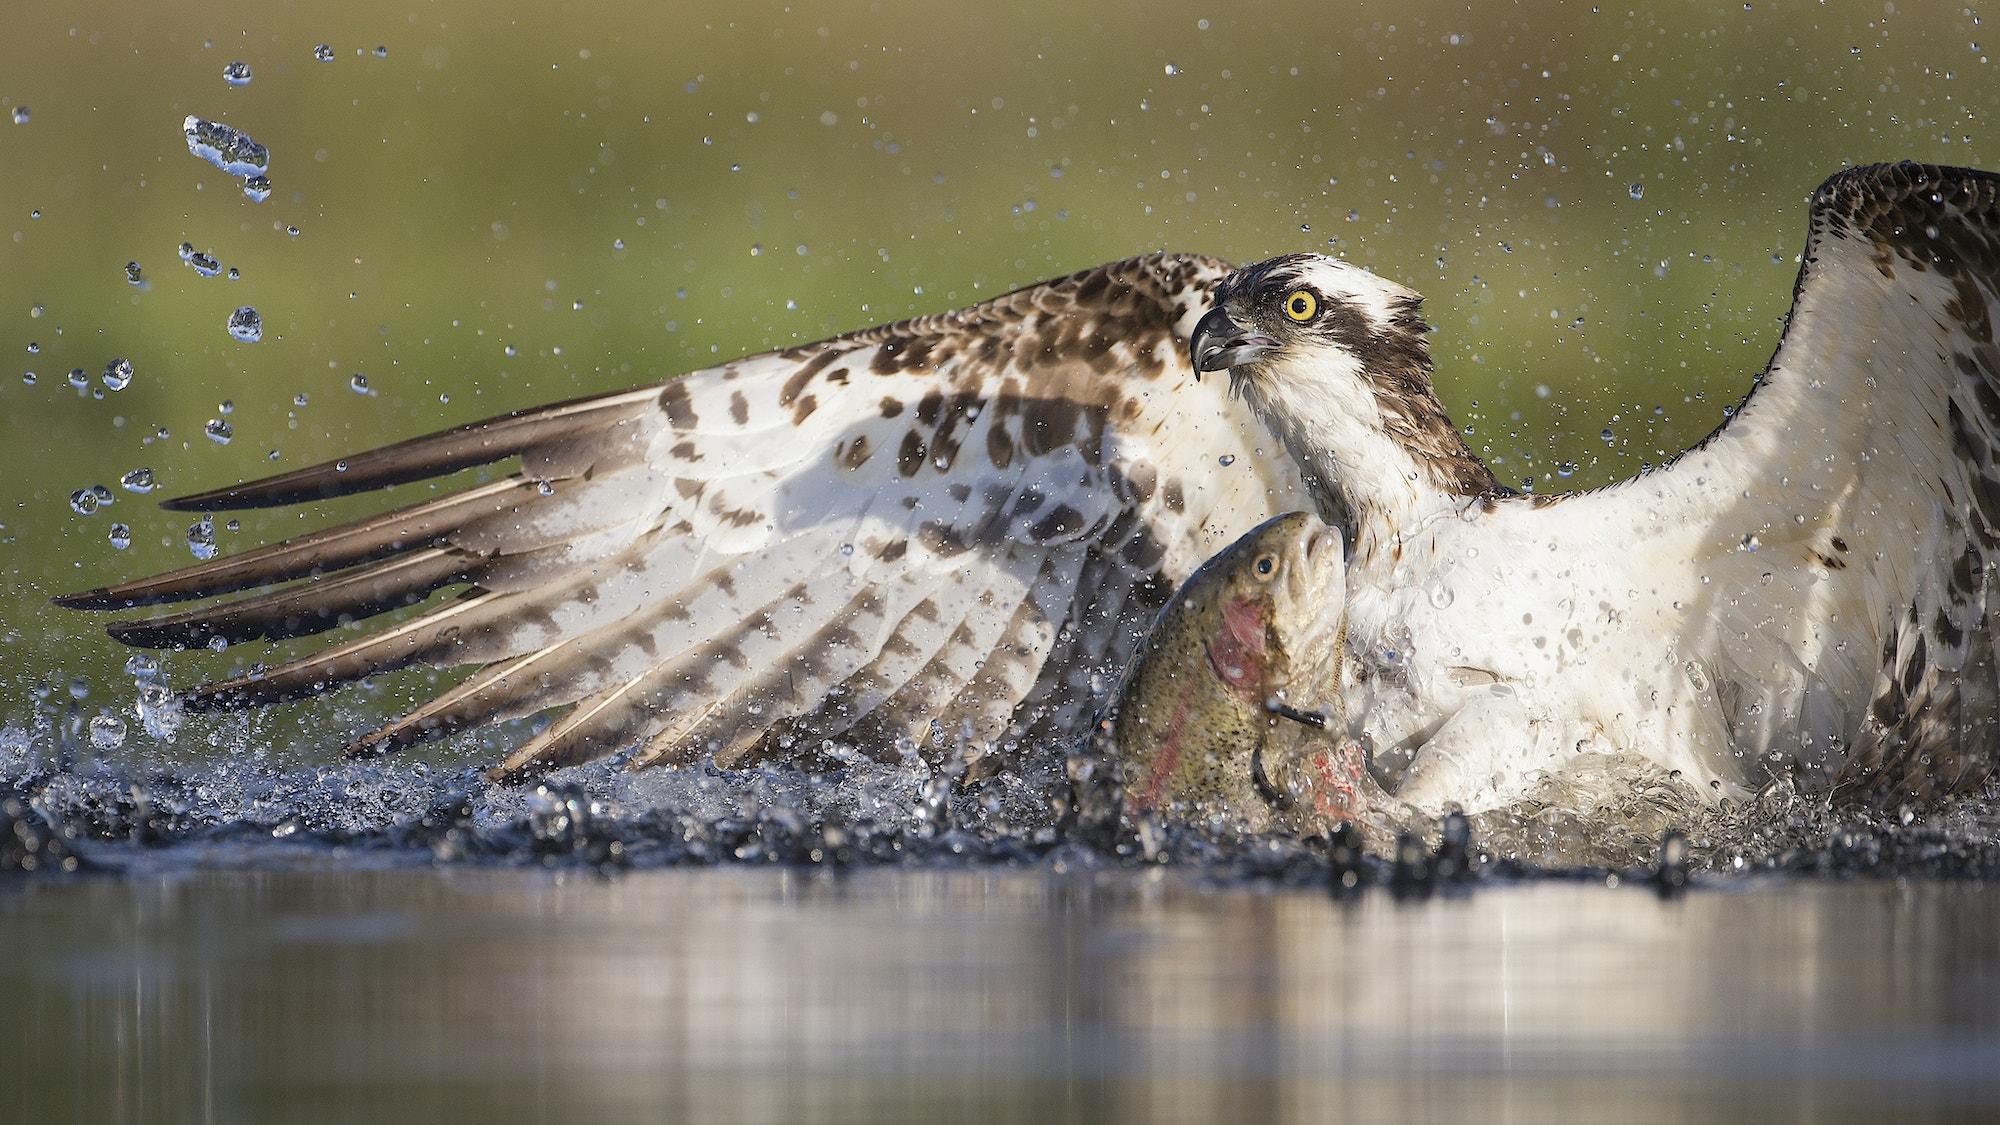 Osprey fishing at dawn Cairngorms National Park Scotland c scotlandbigpicture com